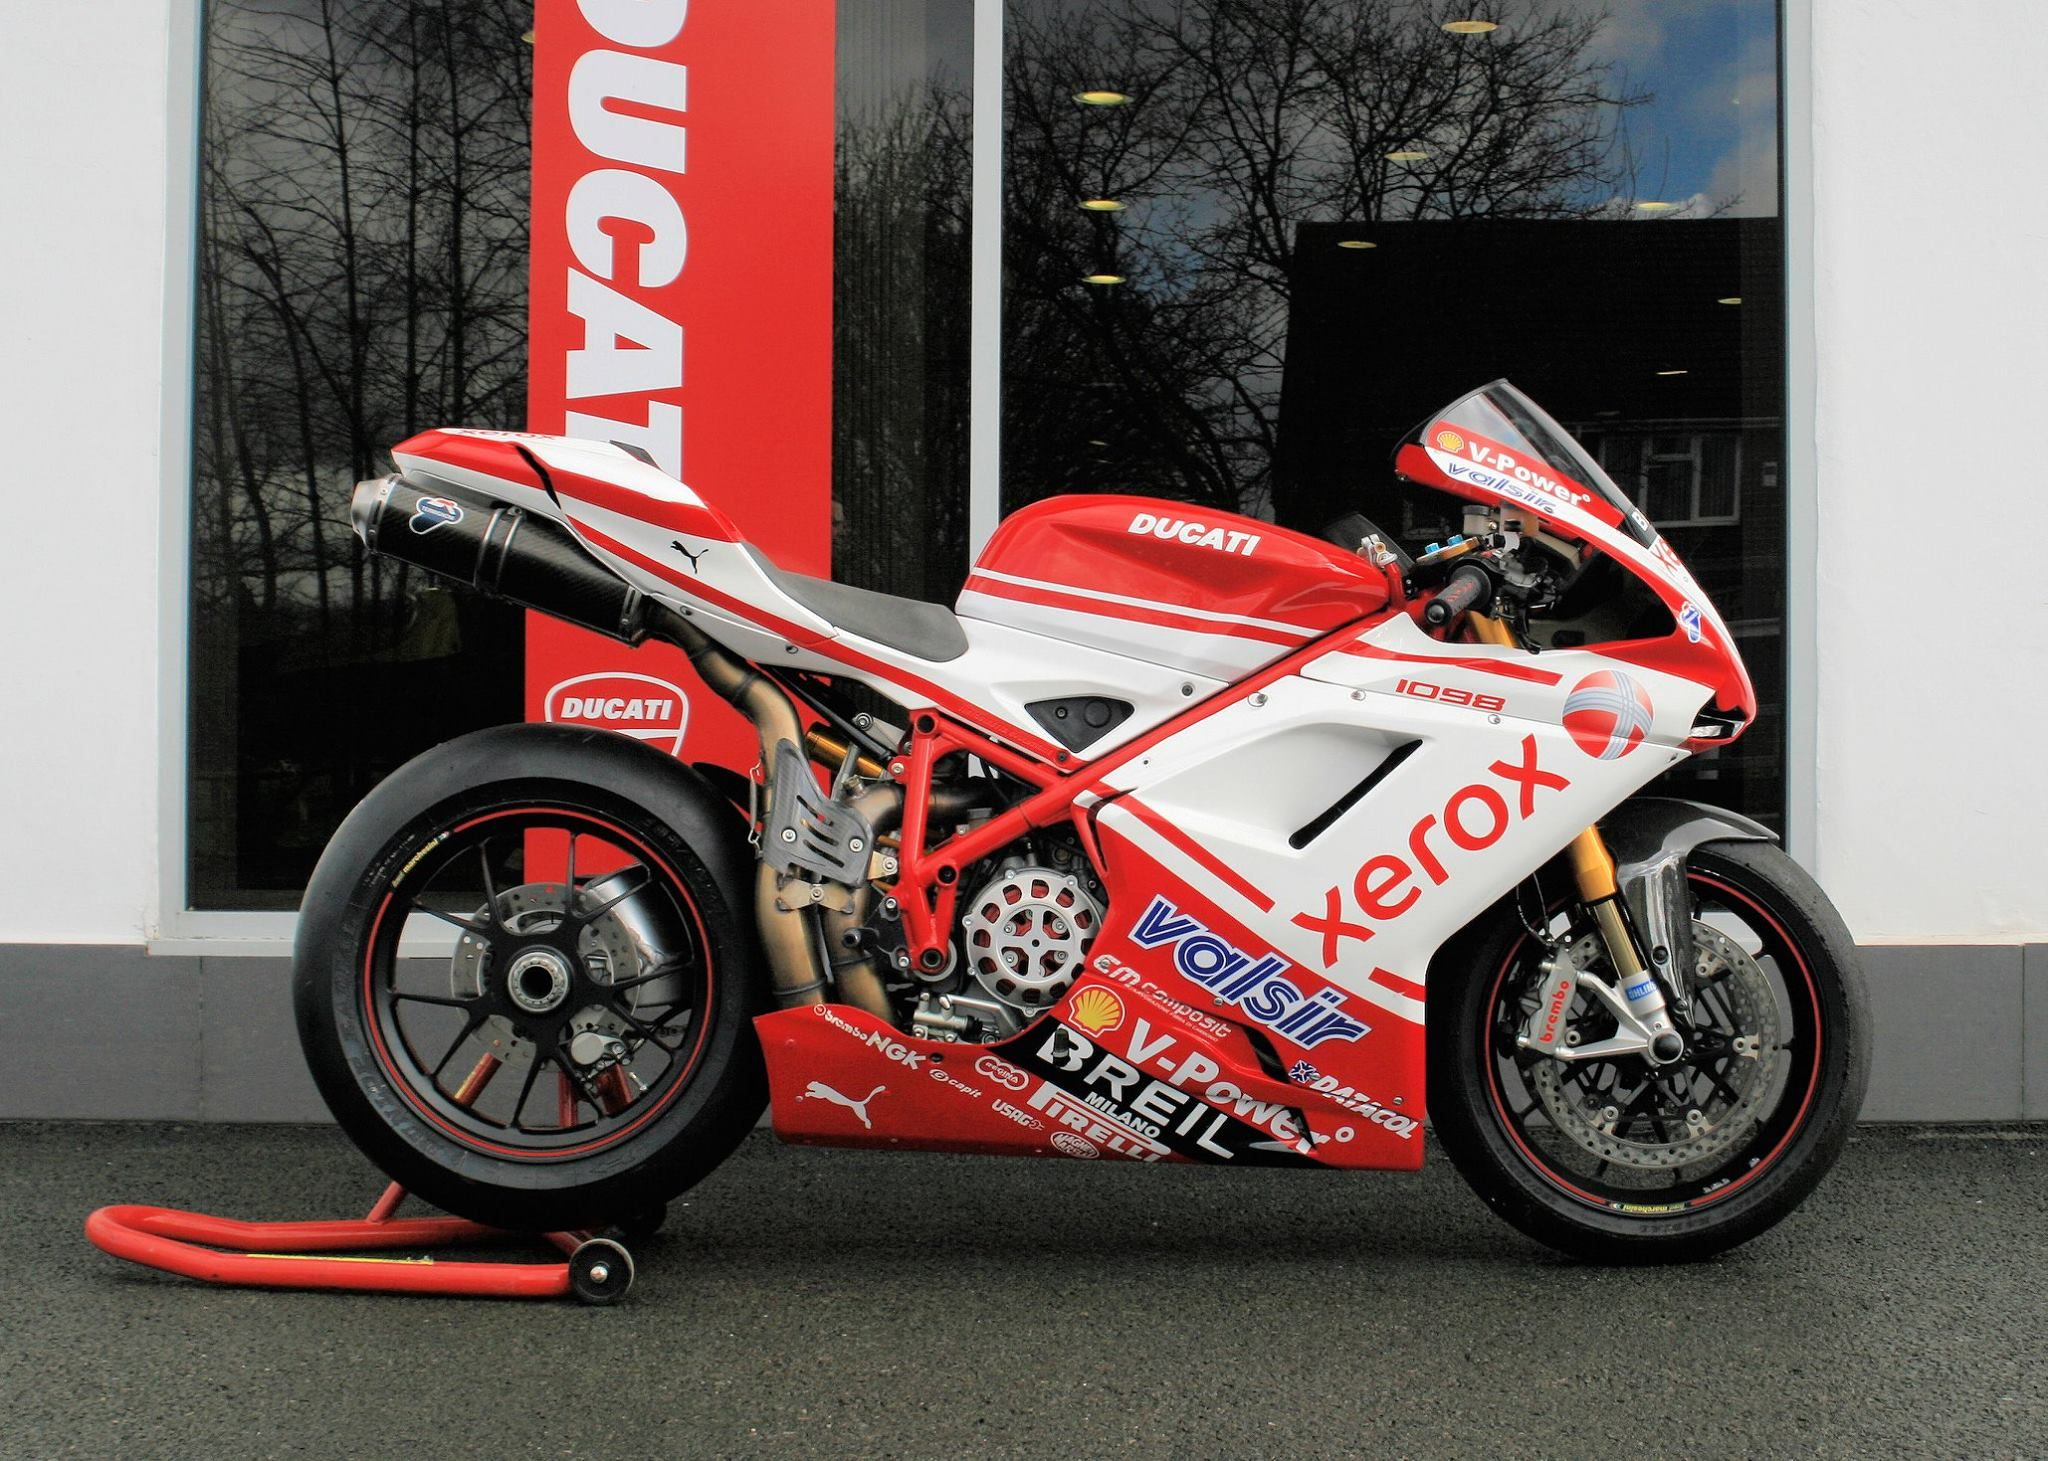 Ducati 1198s Racing Sport Bike: 2007 Ducati 1098S. JHP Track Prepared And Nemesis Traction